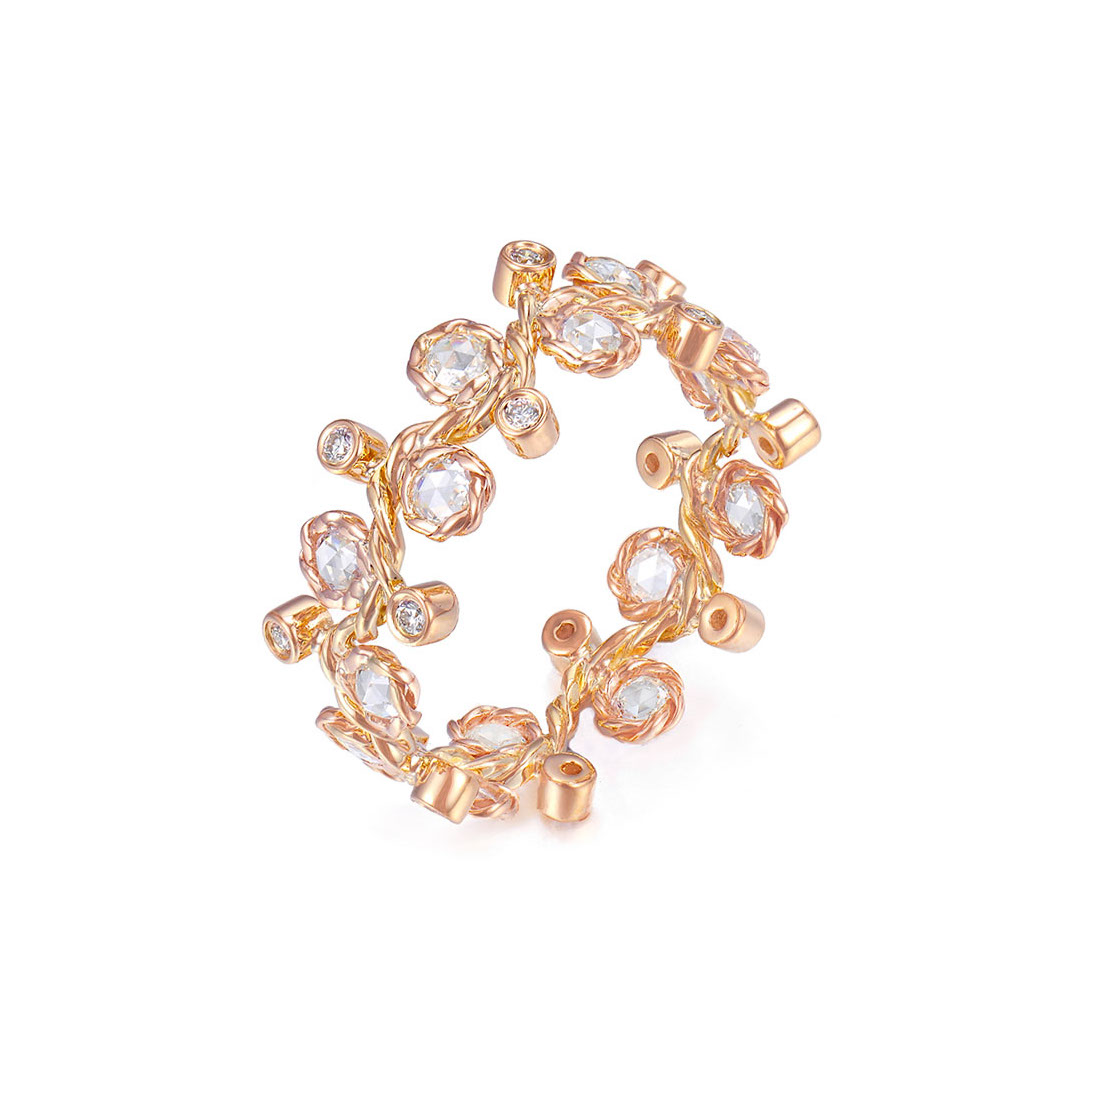 30-1200W-Wavy-Twist-Alternate-Rose-Cut-Diamond-Stacking-Eternity-Gold-Ring-14K-18K-JeweLyrie-